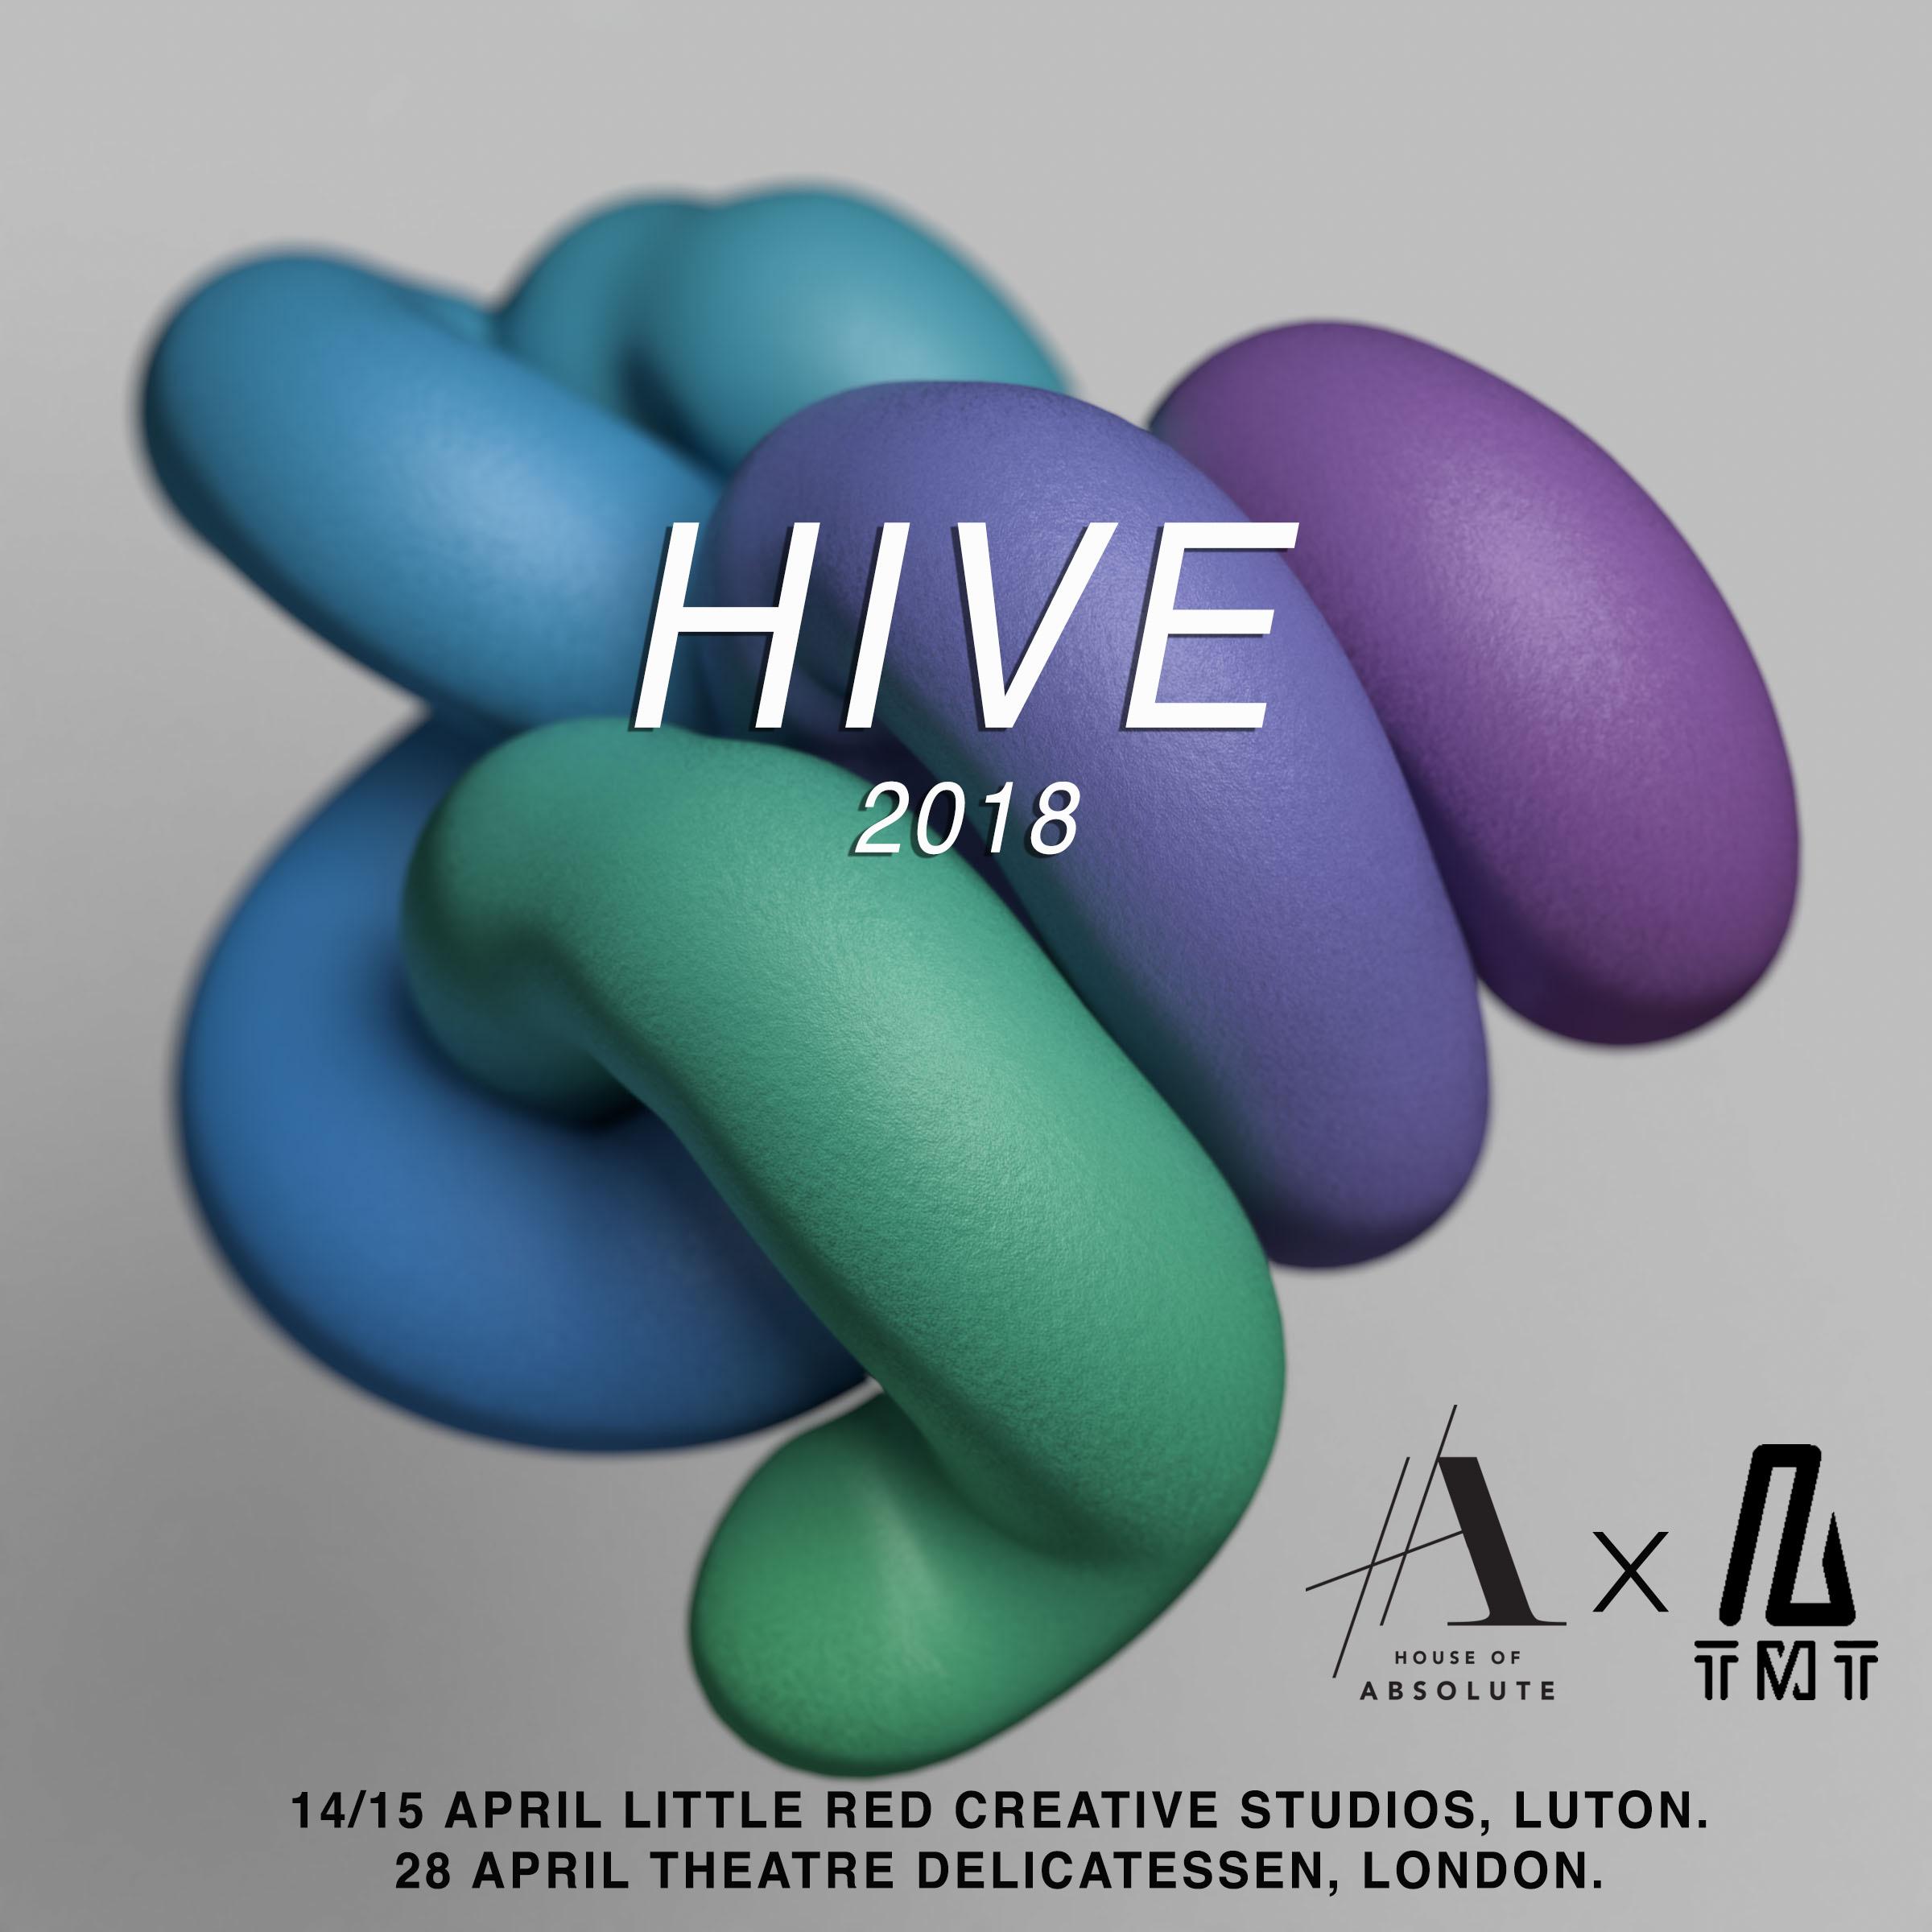 HIVE IMAGE 2.jpg